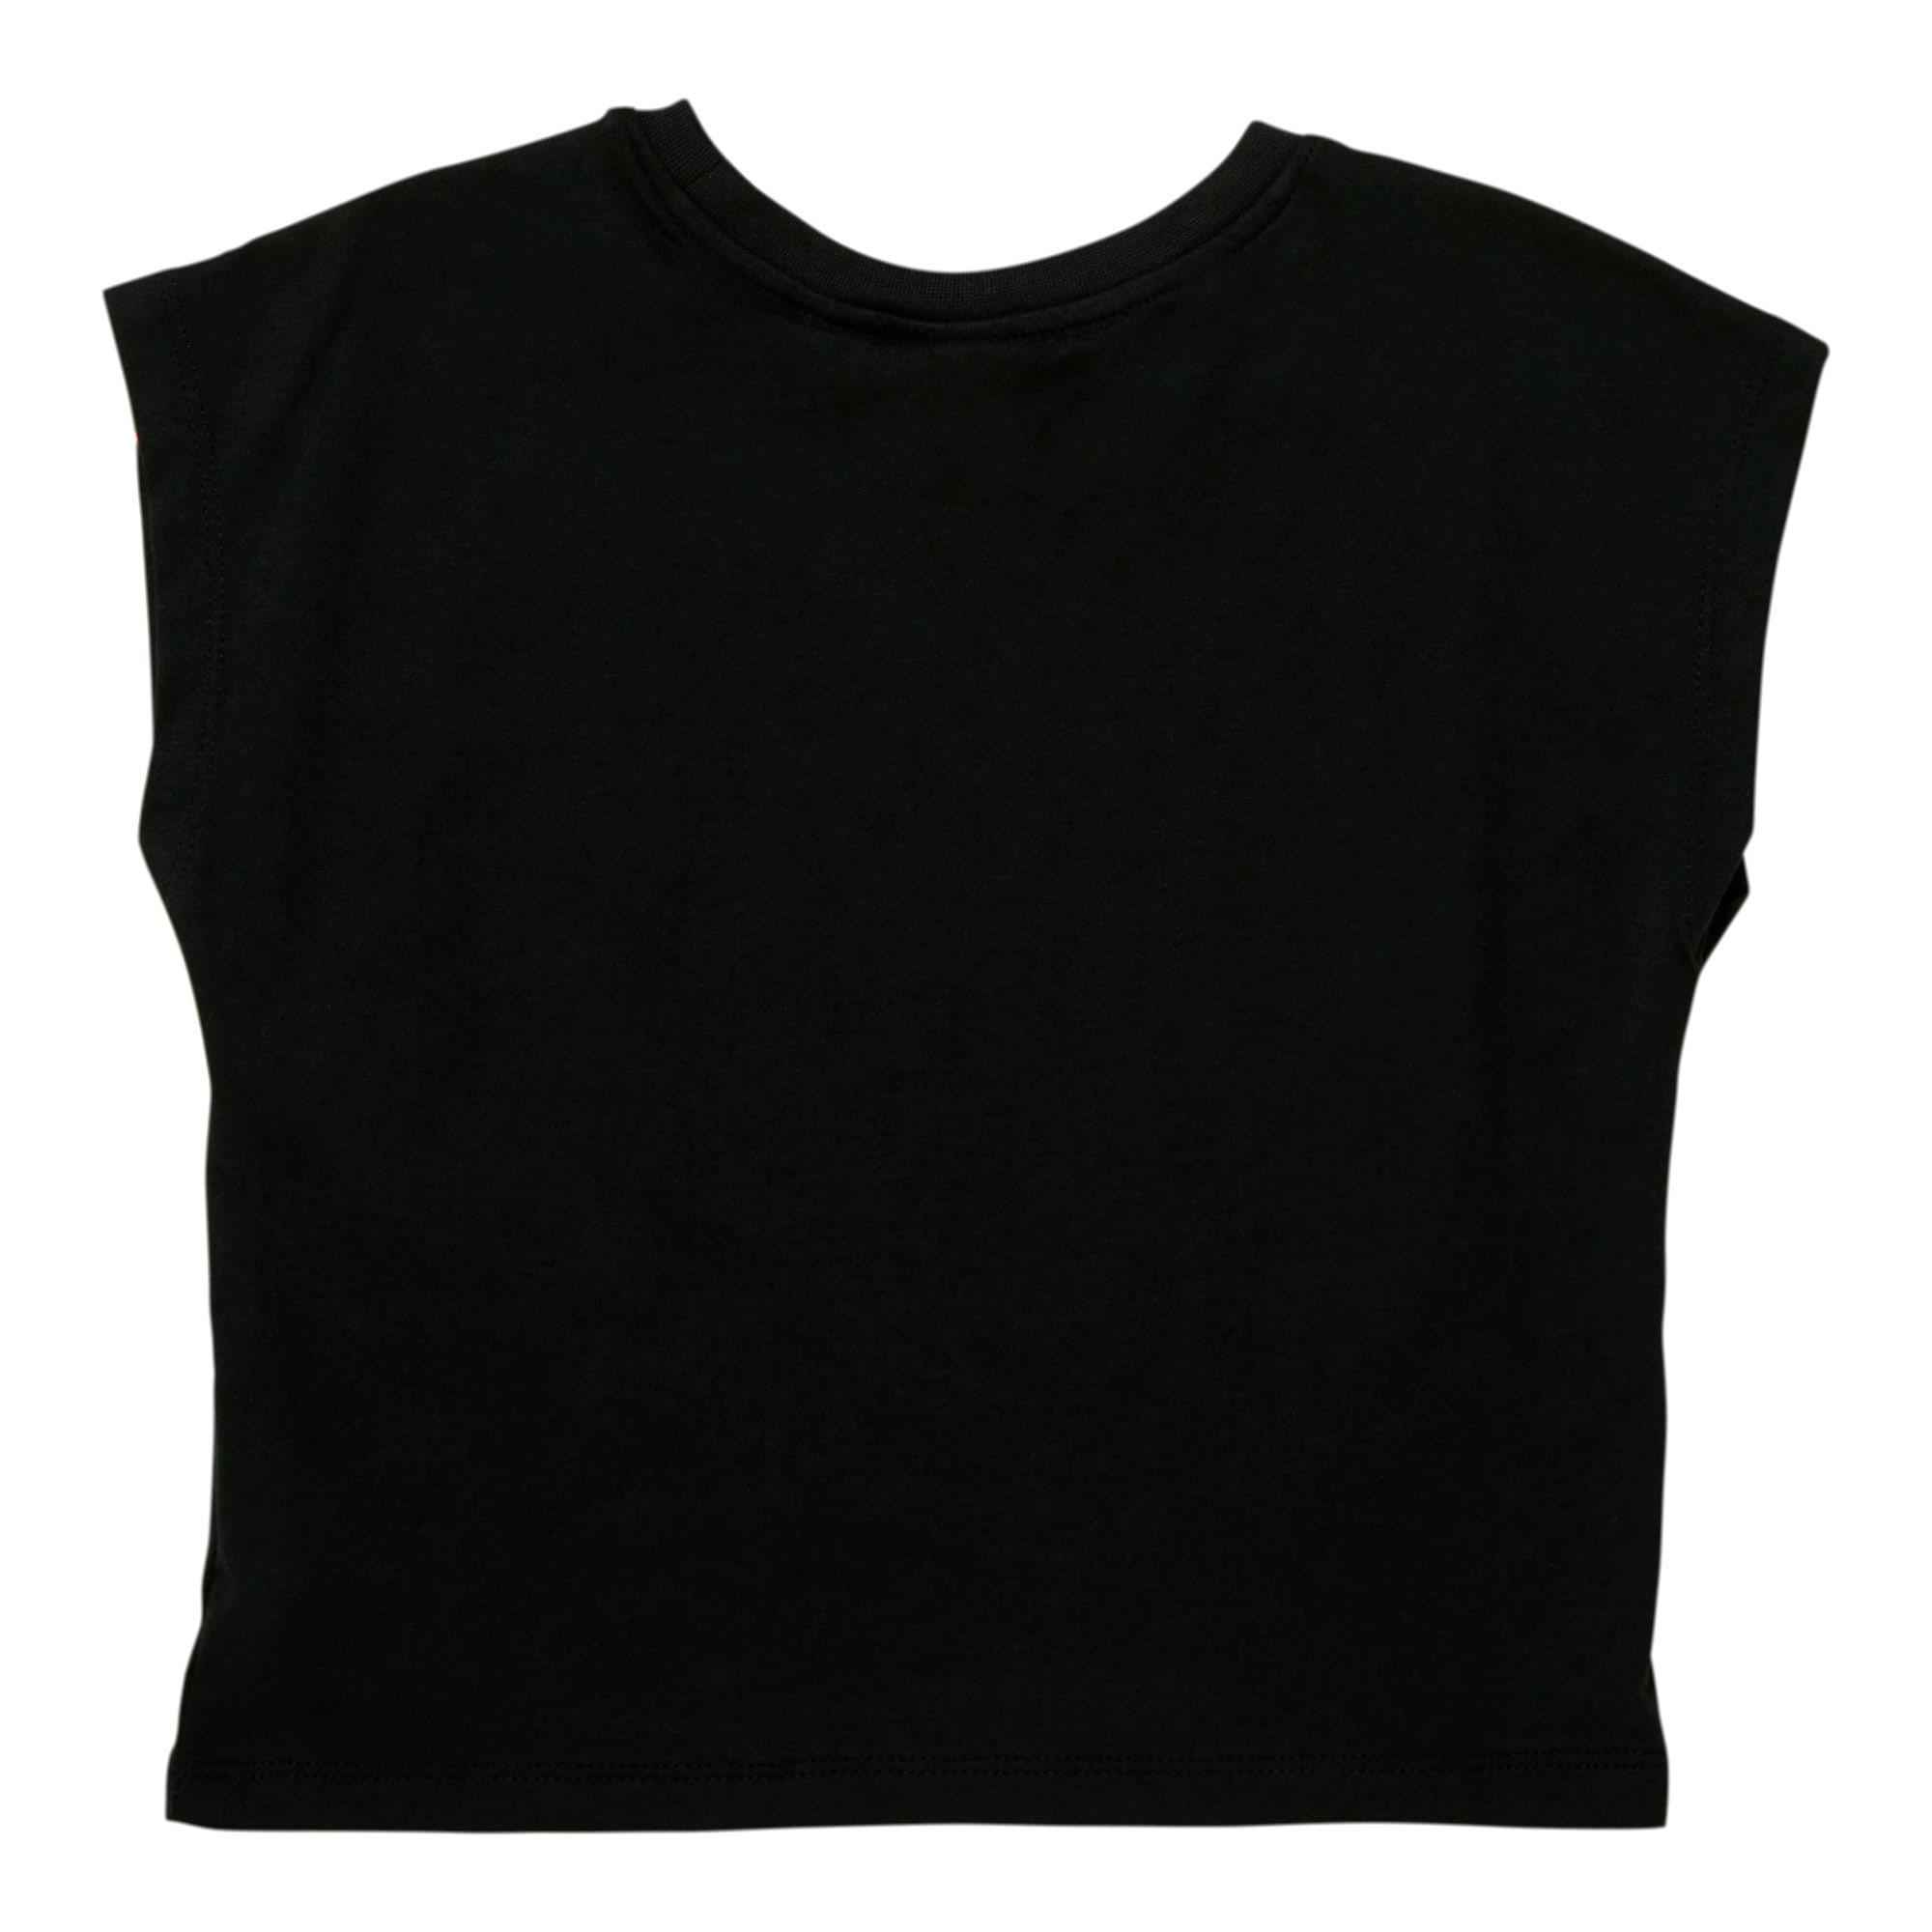 Thumbnail 2 of Amplified Pack Little Kids' Fashion Tee, PUMA BLACK, medium